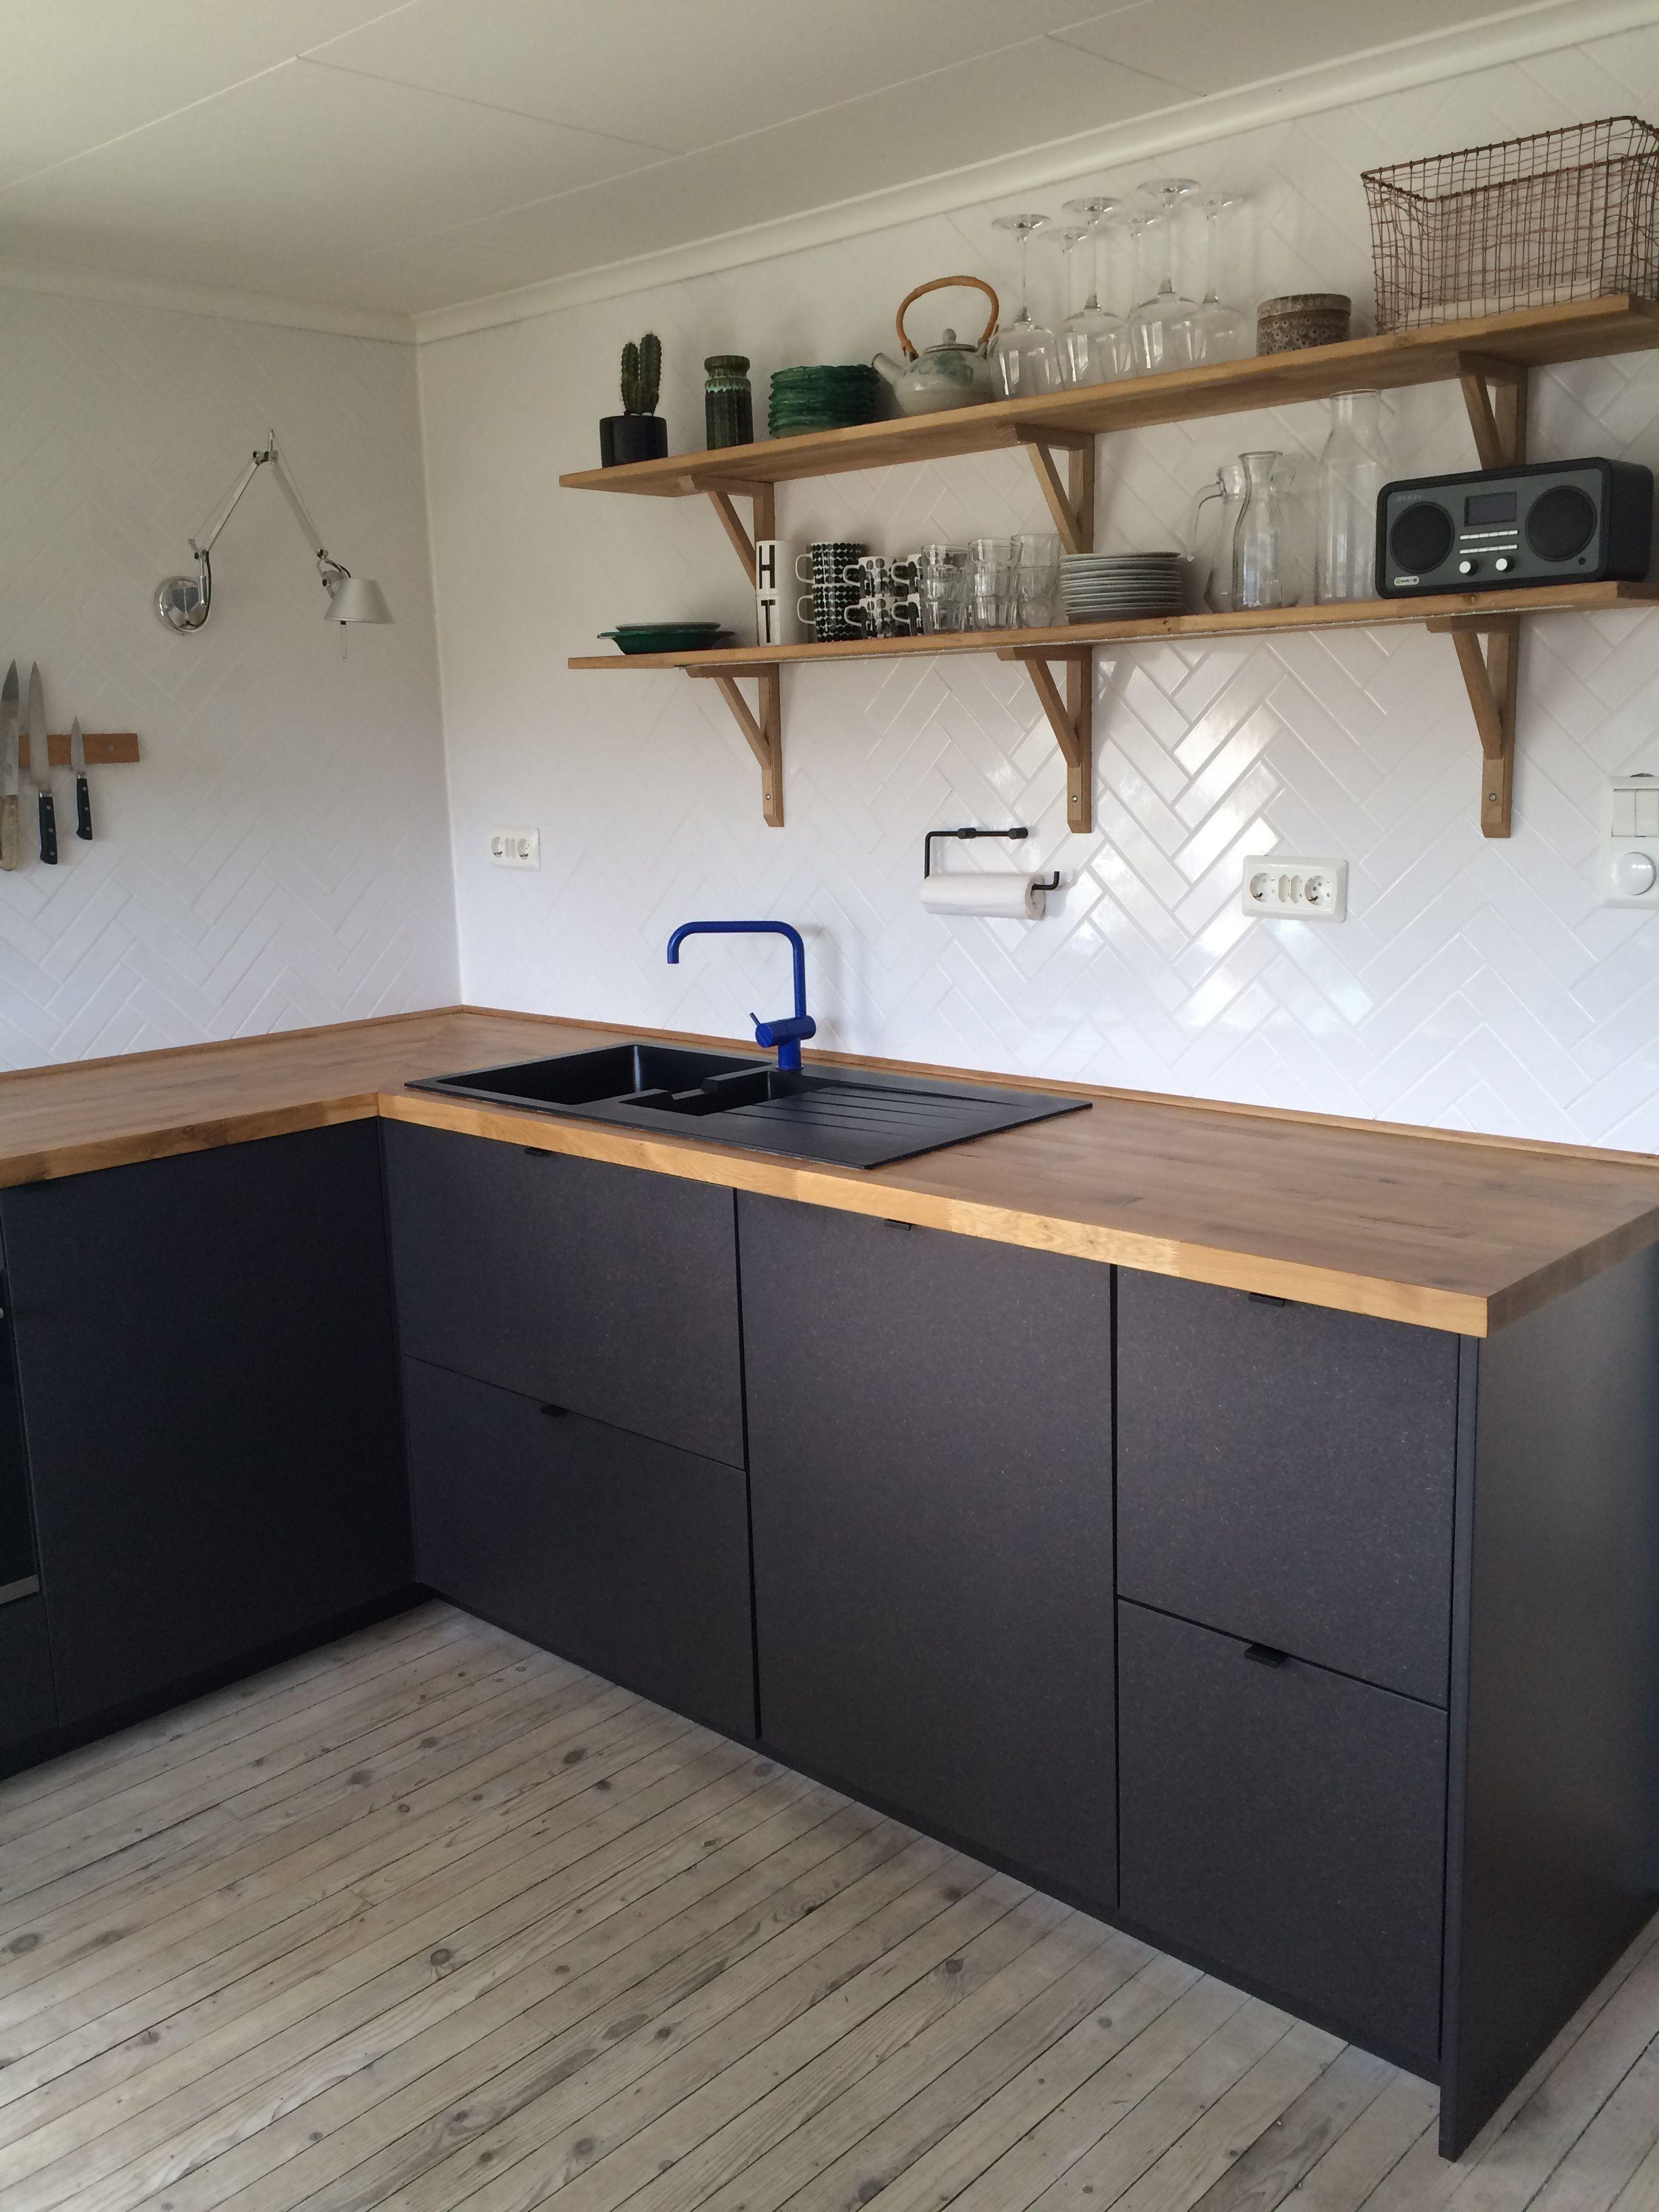 bildergebnis f r cuisine kungsbacka plaashuis ikea. Black Bedroom Furniture Sets. Home Design Ideas